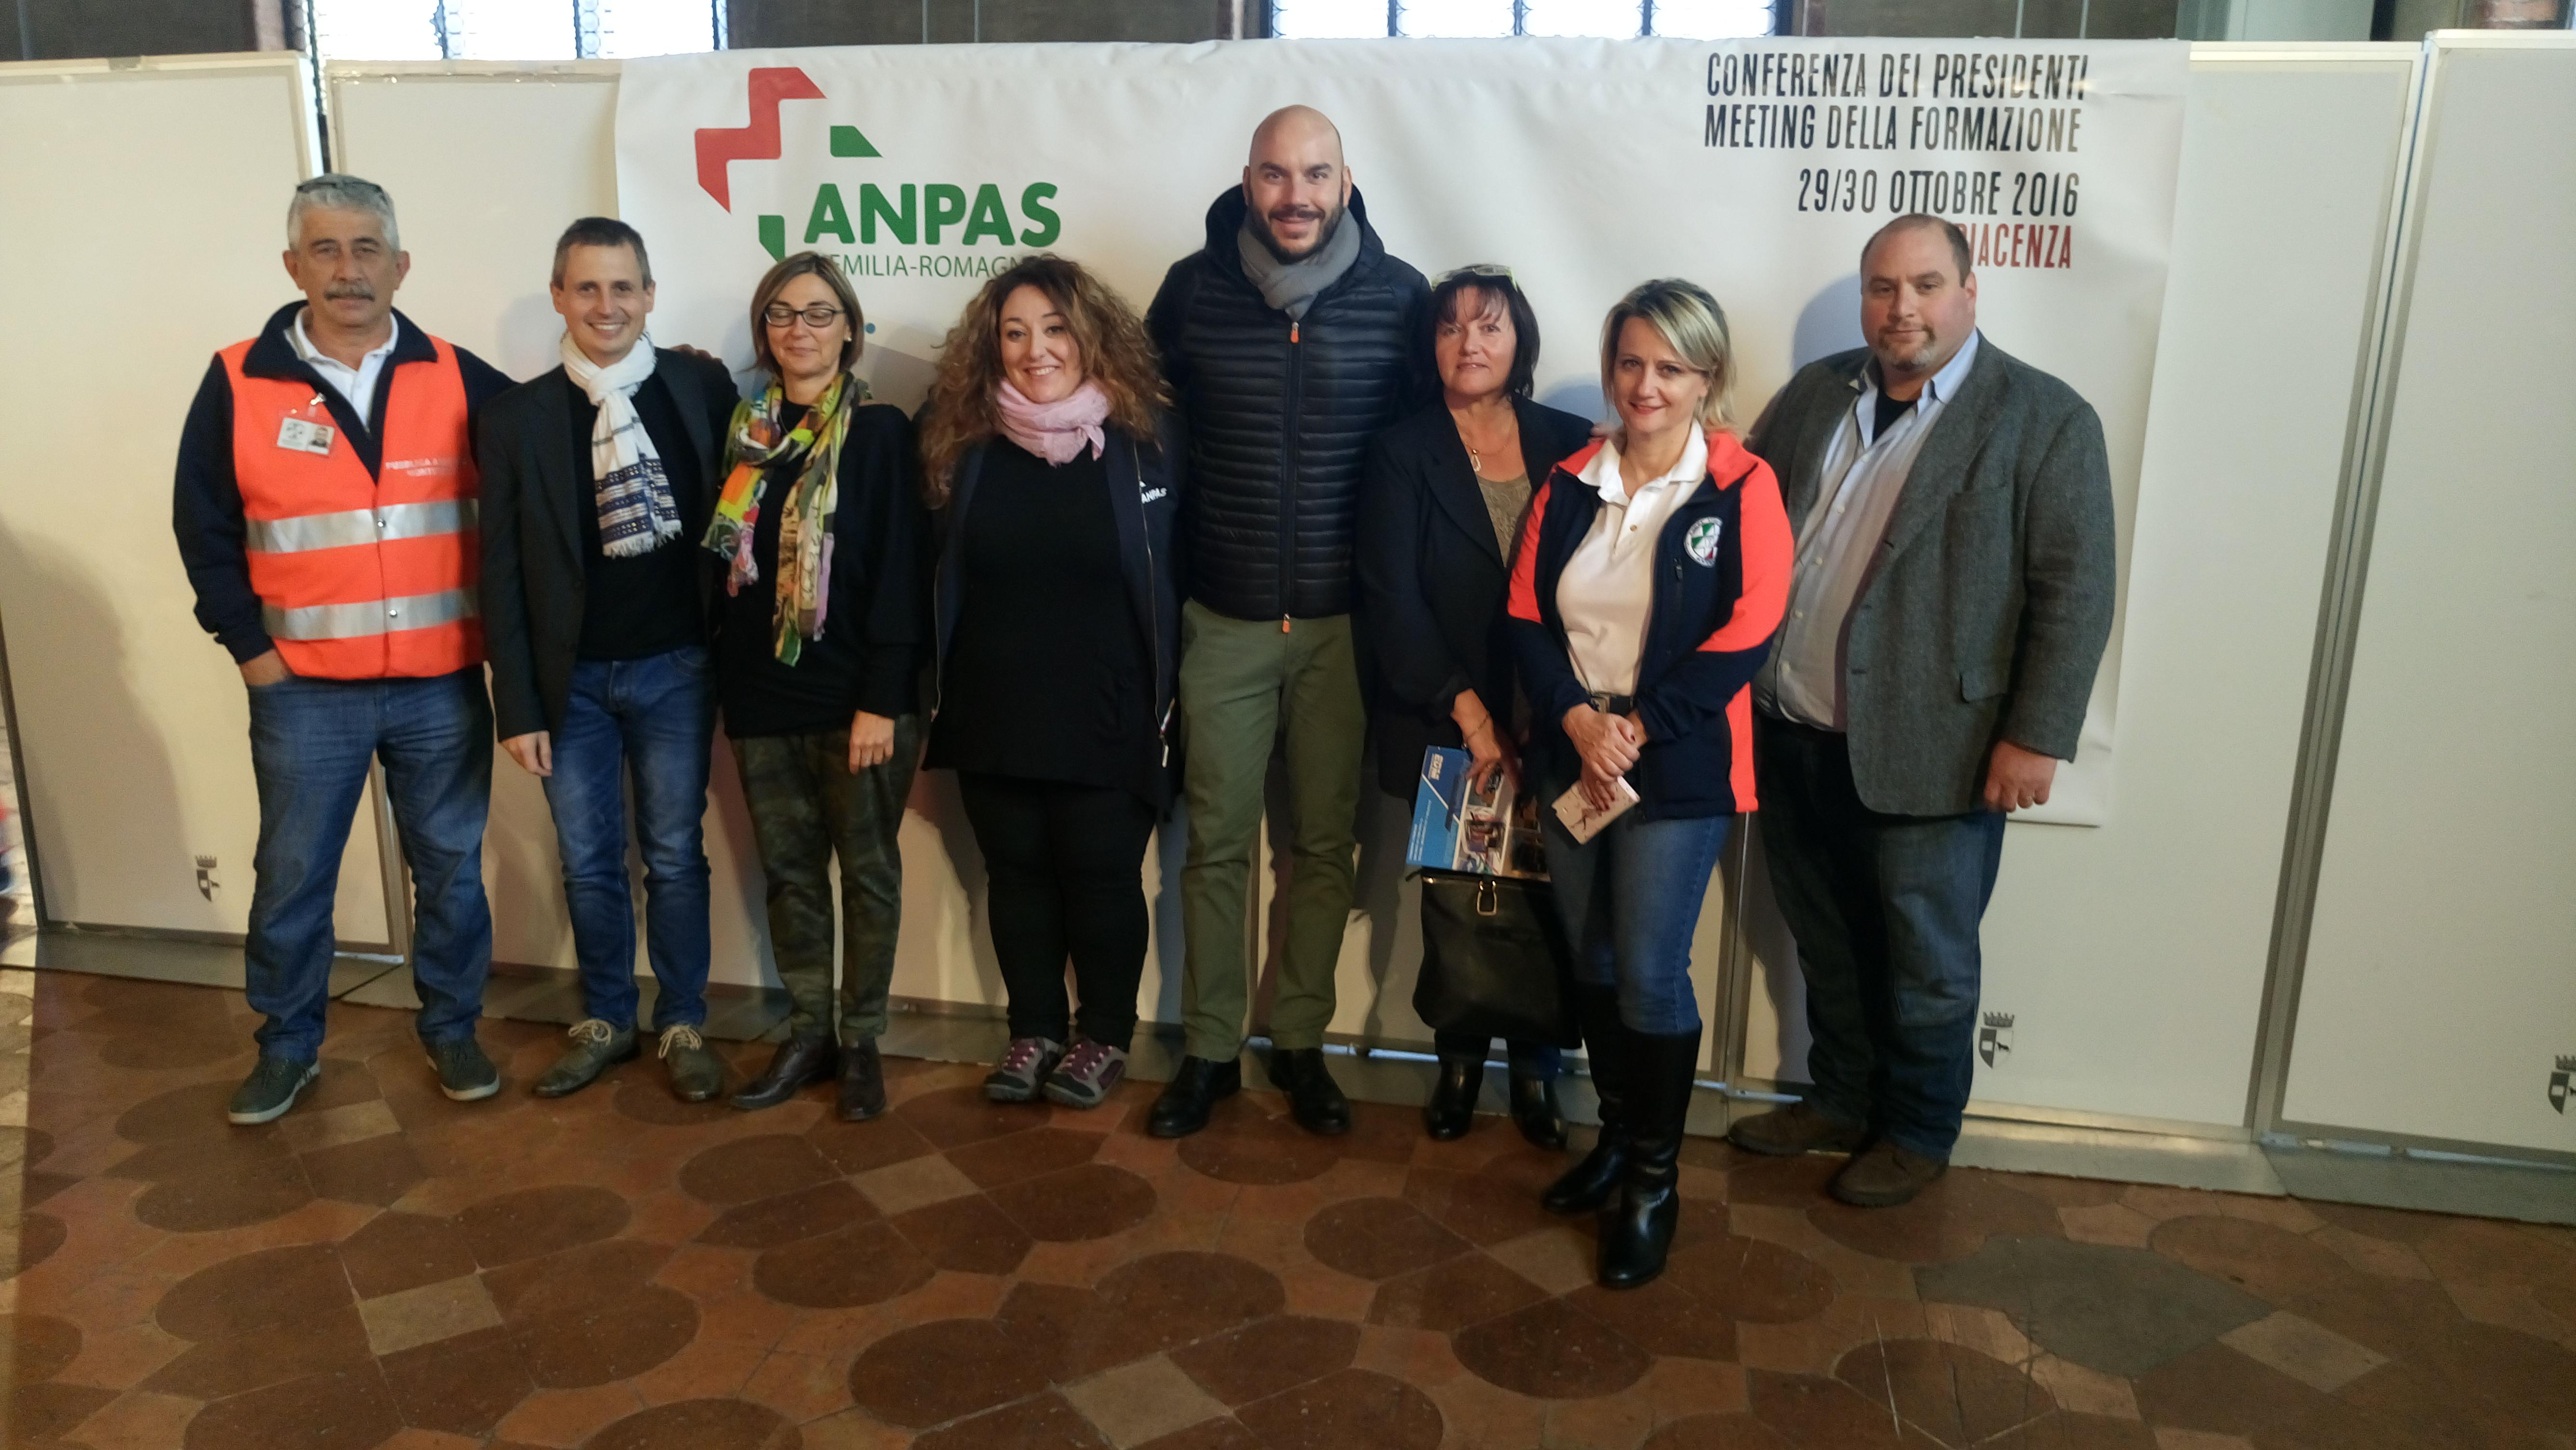 Conferenza Presidenti ANPAS Emilia Romagna